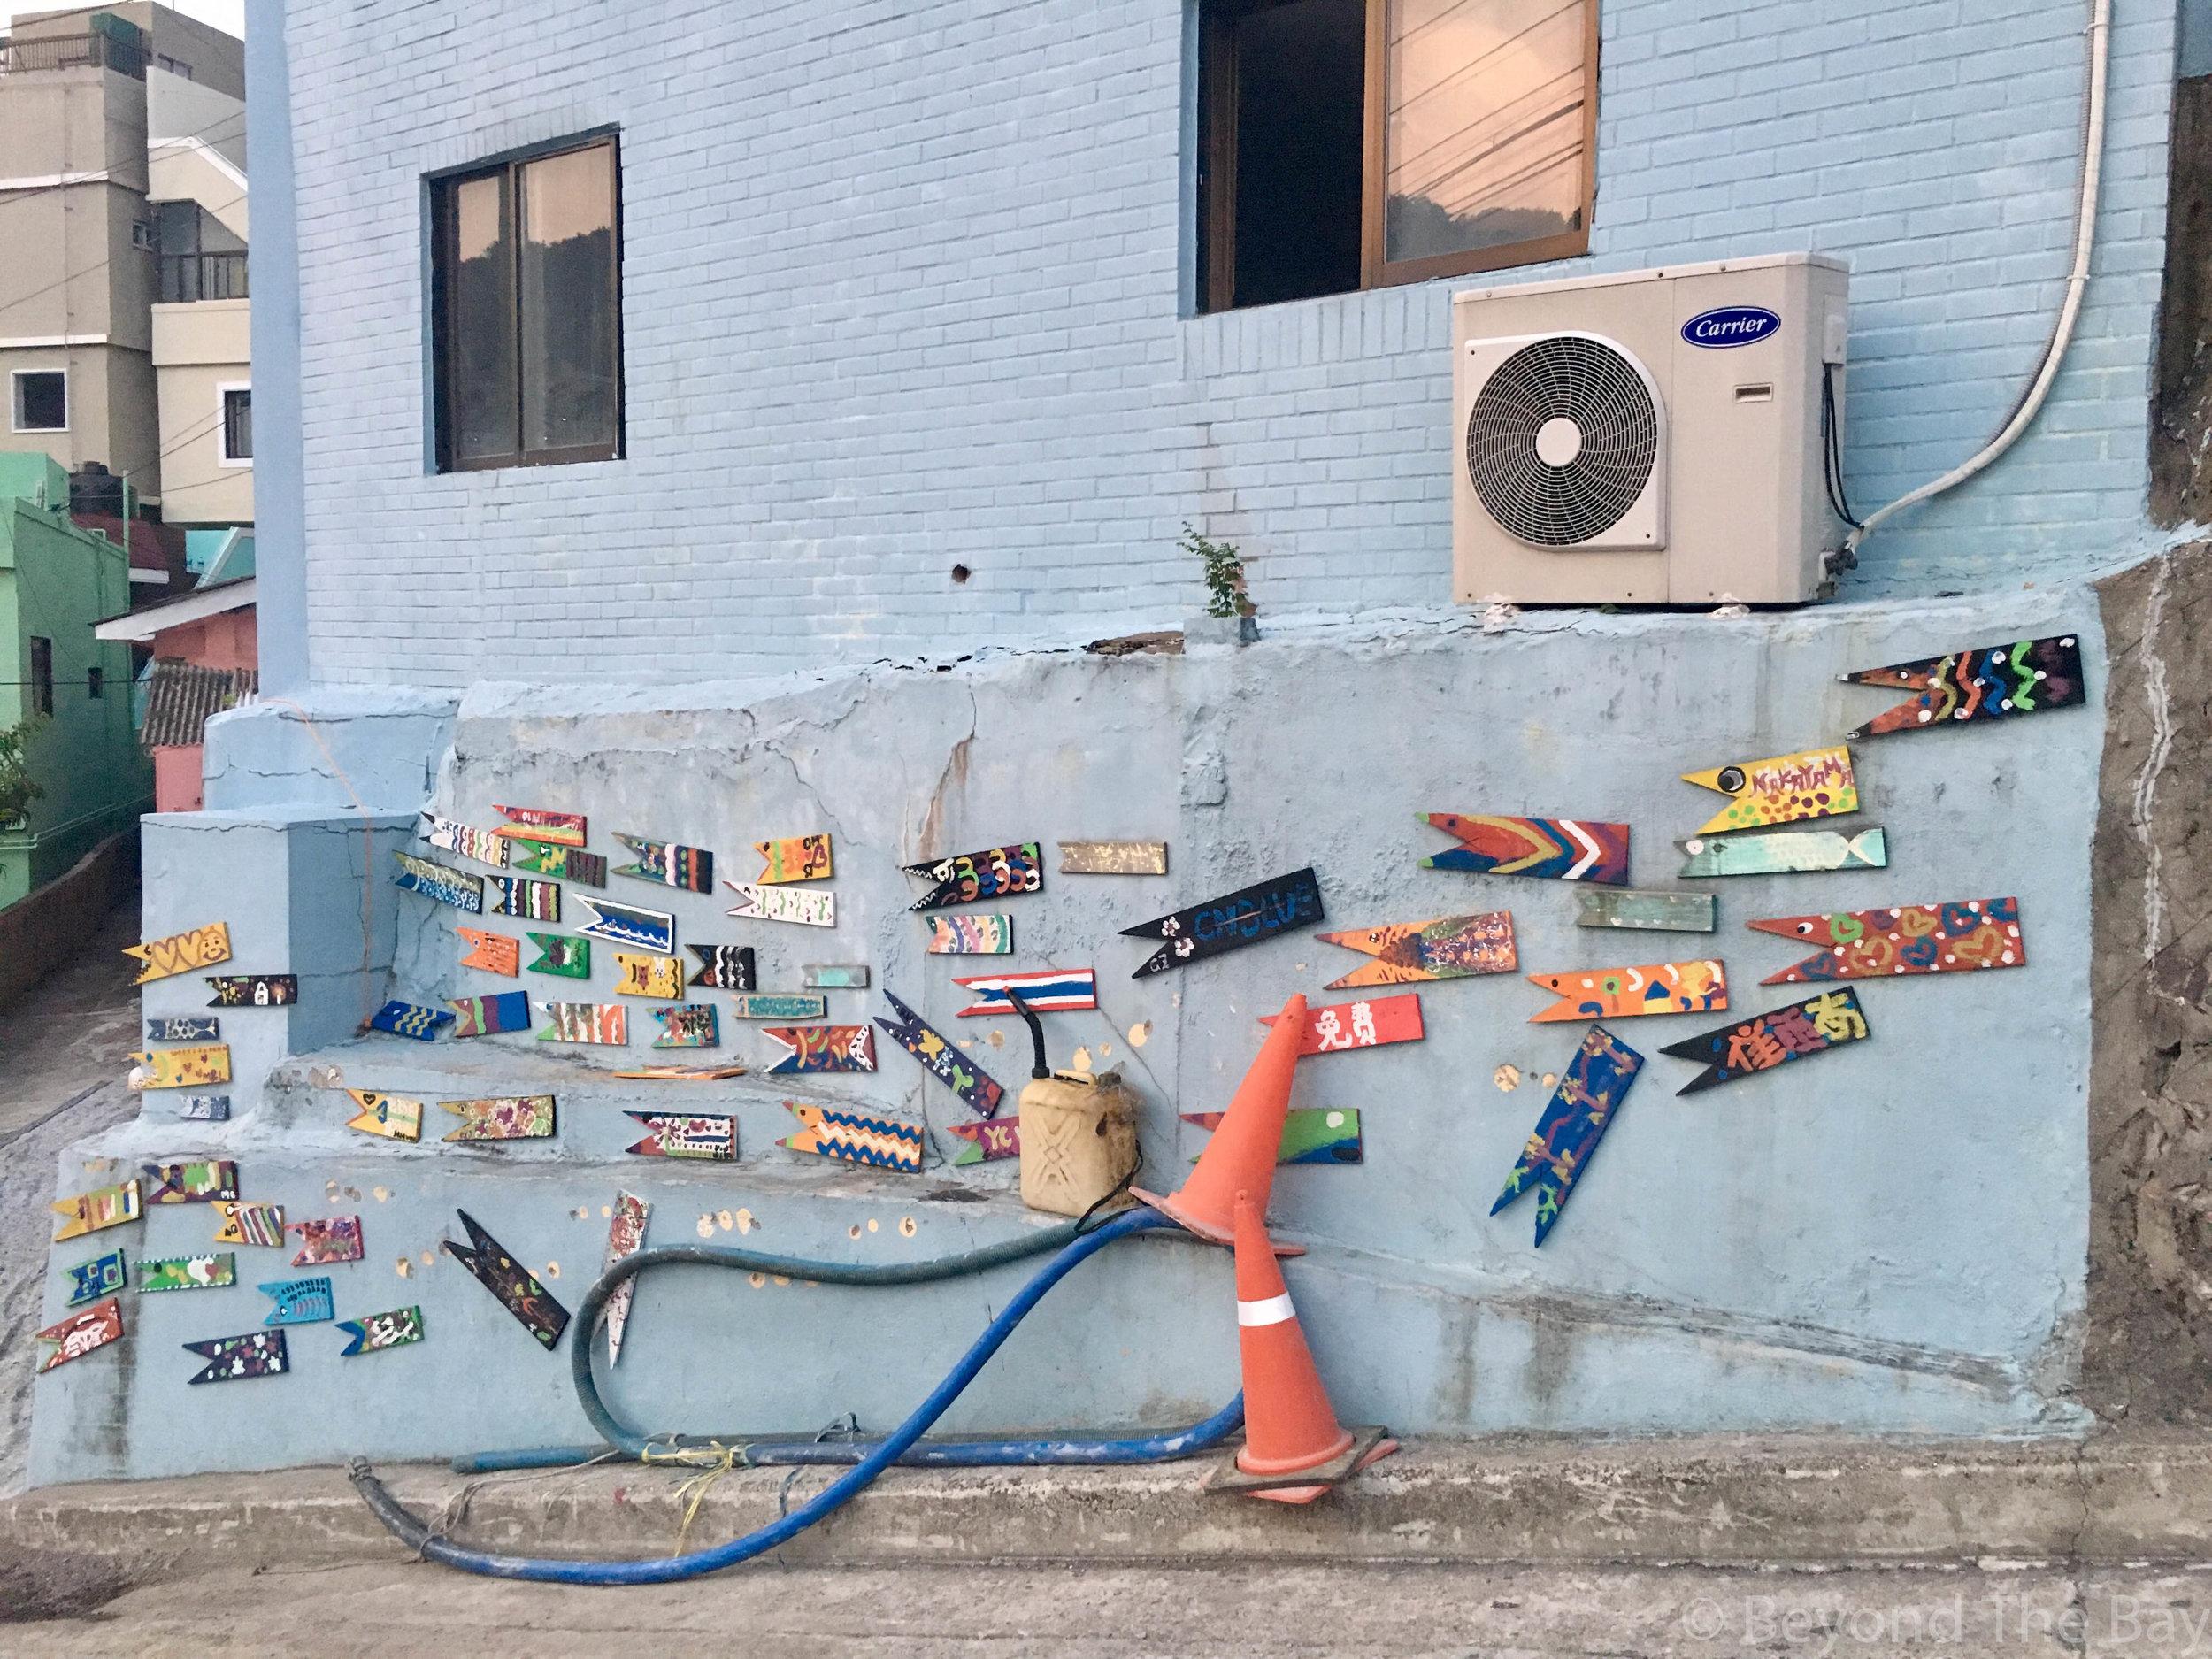 More artwork around the cultural village